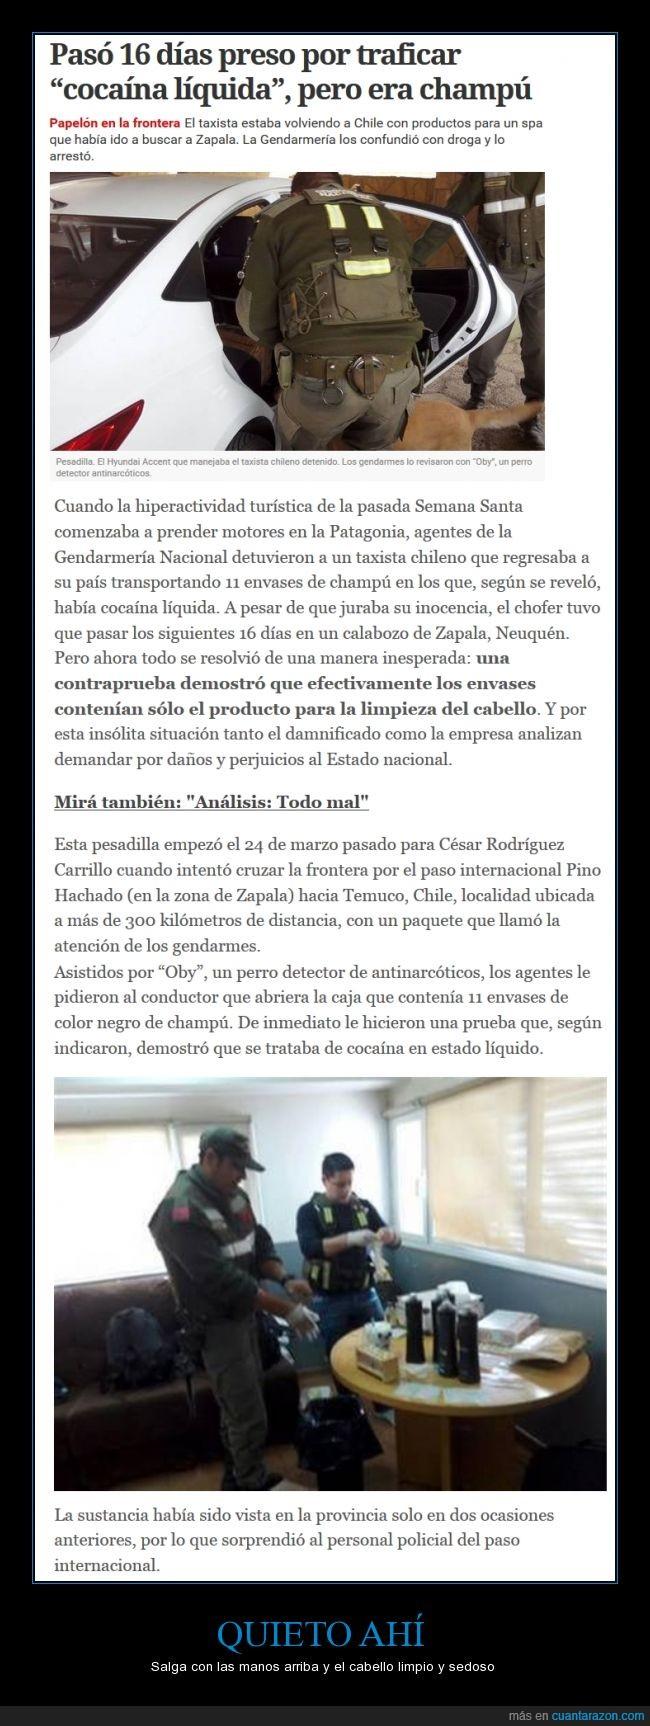 16,16 días preso,Argentina,arrestado,calabozo,César Rodríguez,champú,Chile,clarín,coca,días,falso,gendarmería,injusto,inocente,liquida,Neuquén,preso,shampoo,Zapala